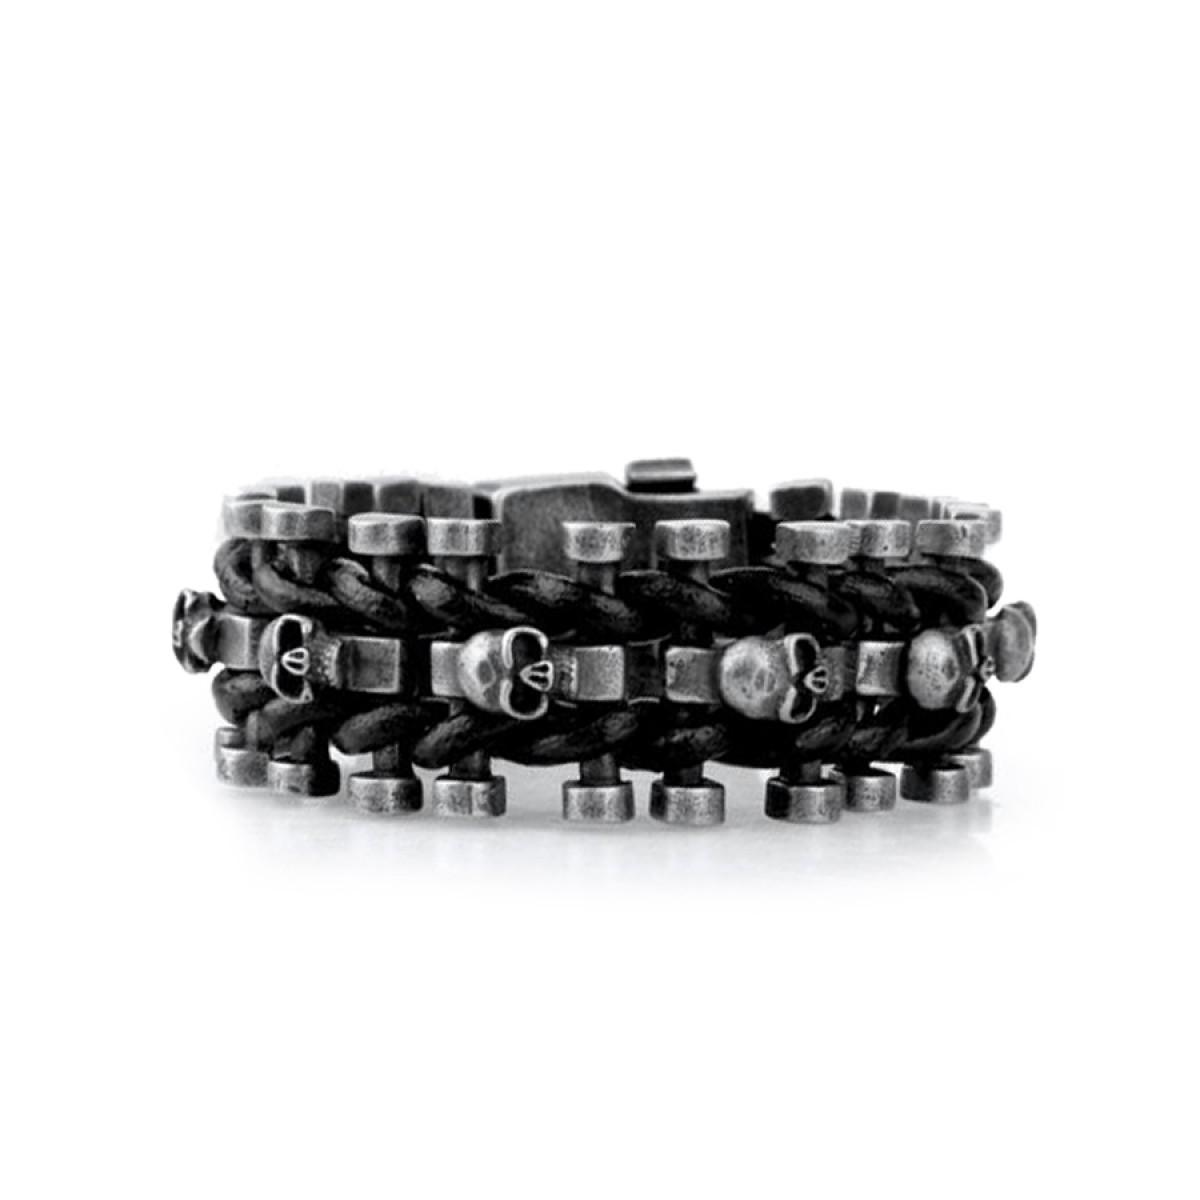 Skull Bracelet Steel and Leather Mens | LATICCI